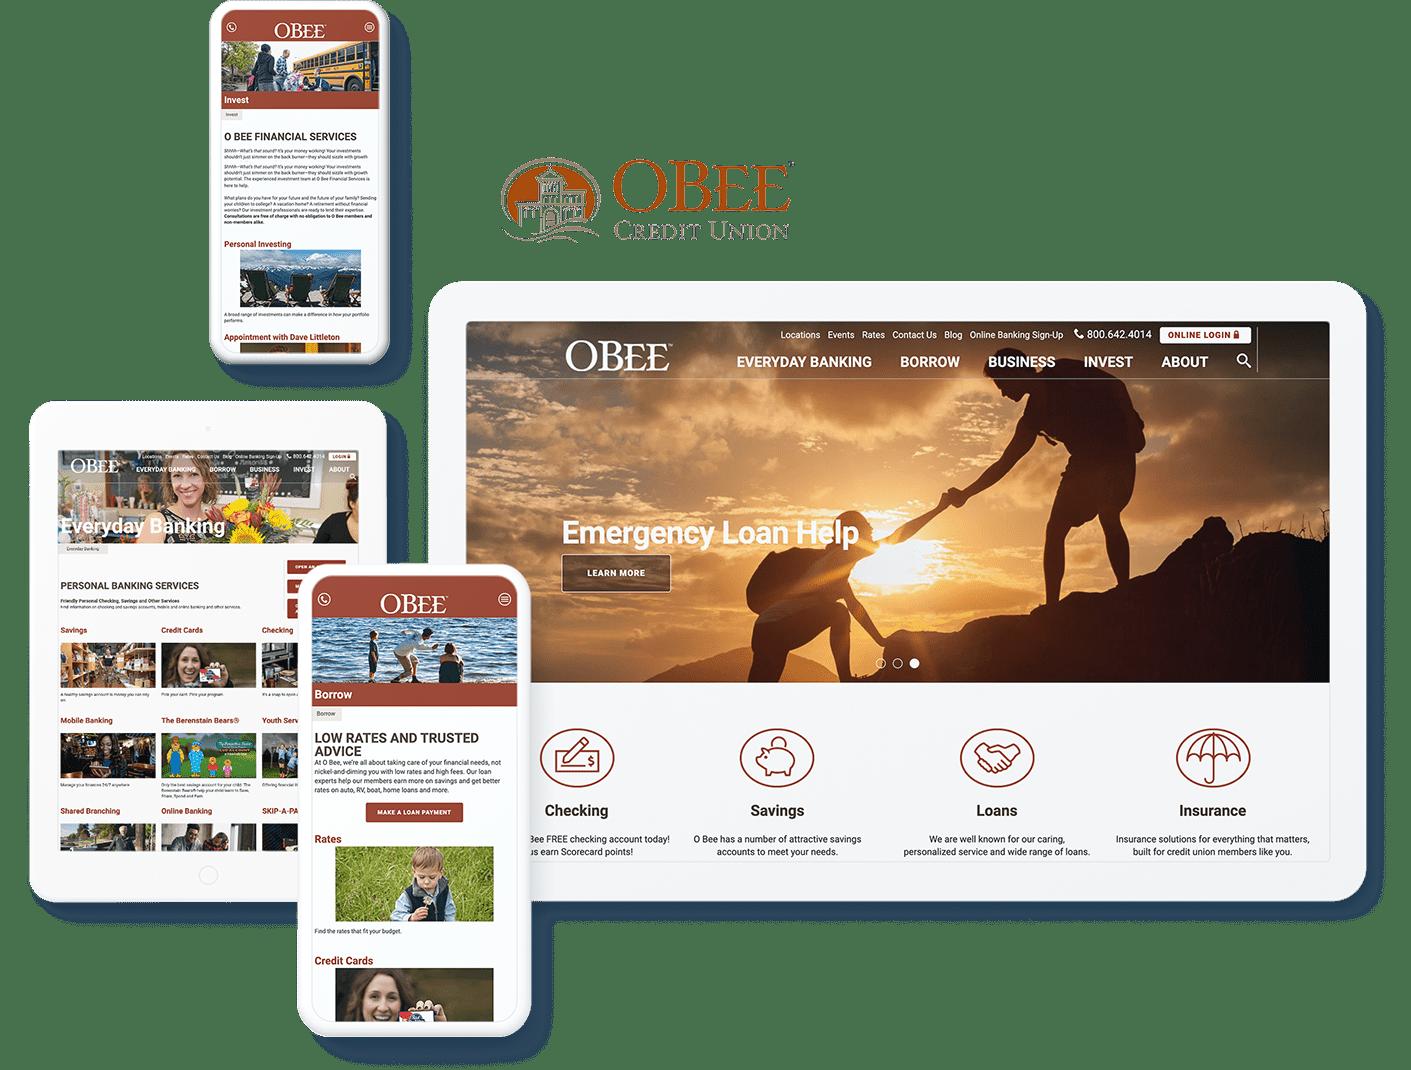 Obee Credit Union